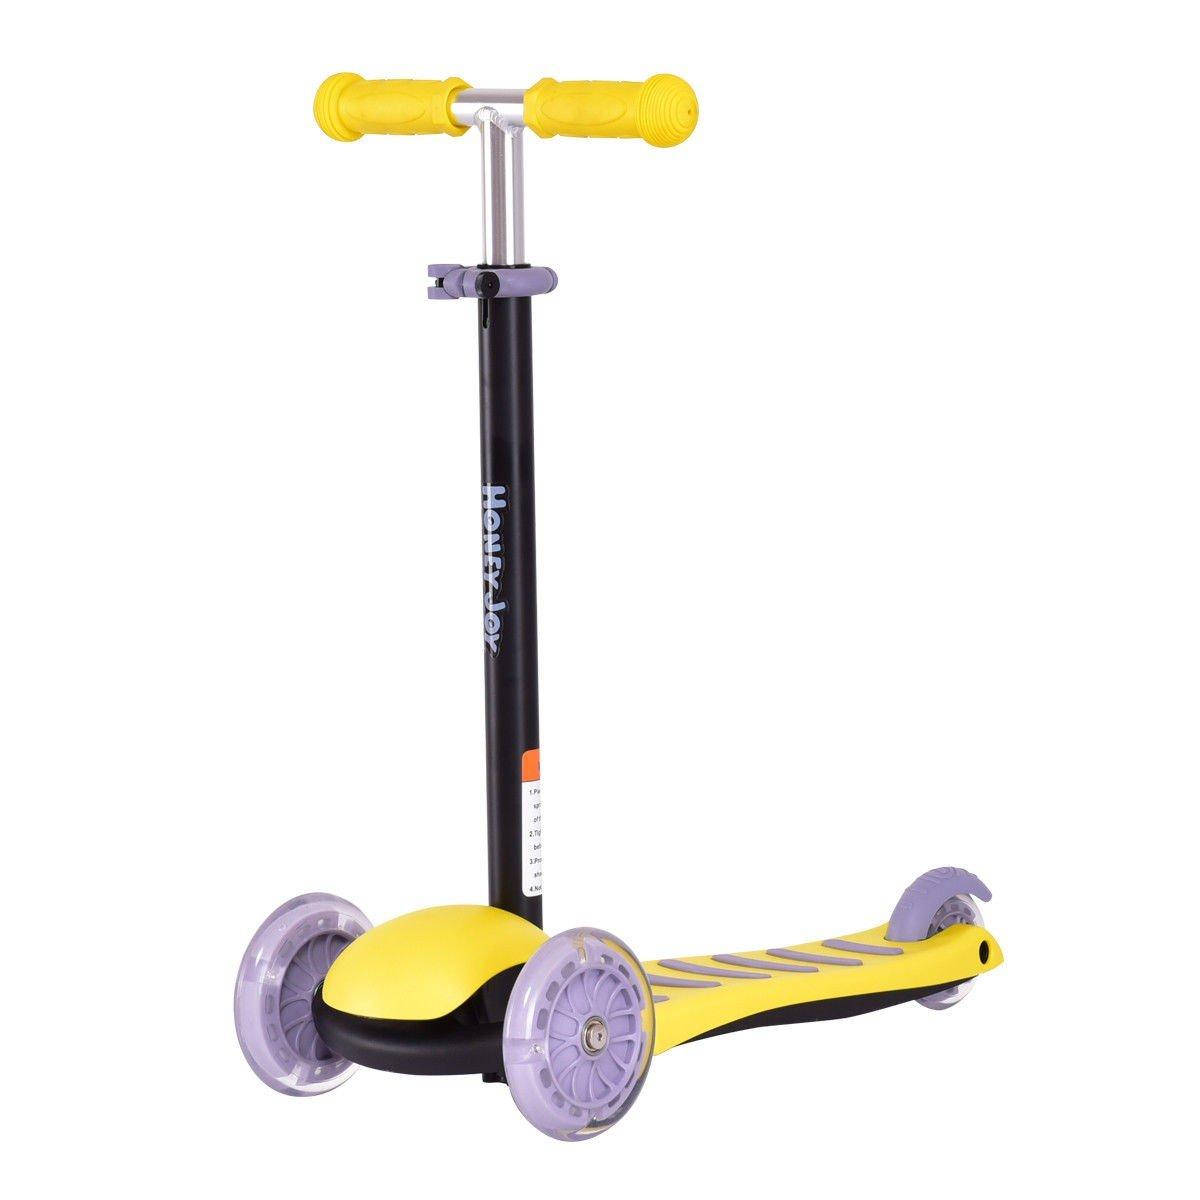 MD Group Kids Kick Scooter Yellow Adjustable Height Handlebar 3 LED Light up PU Wheels